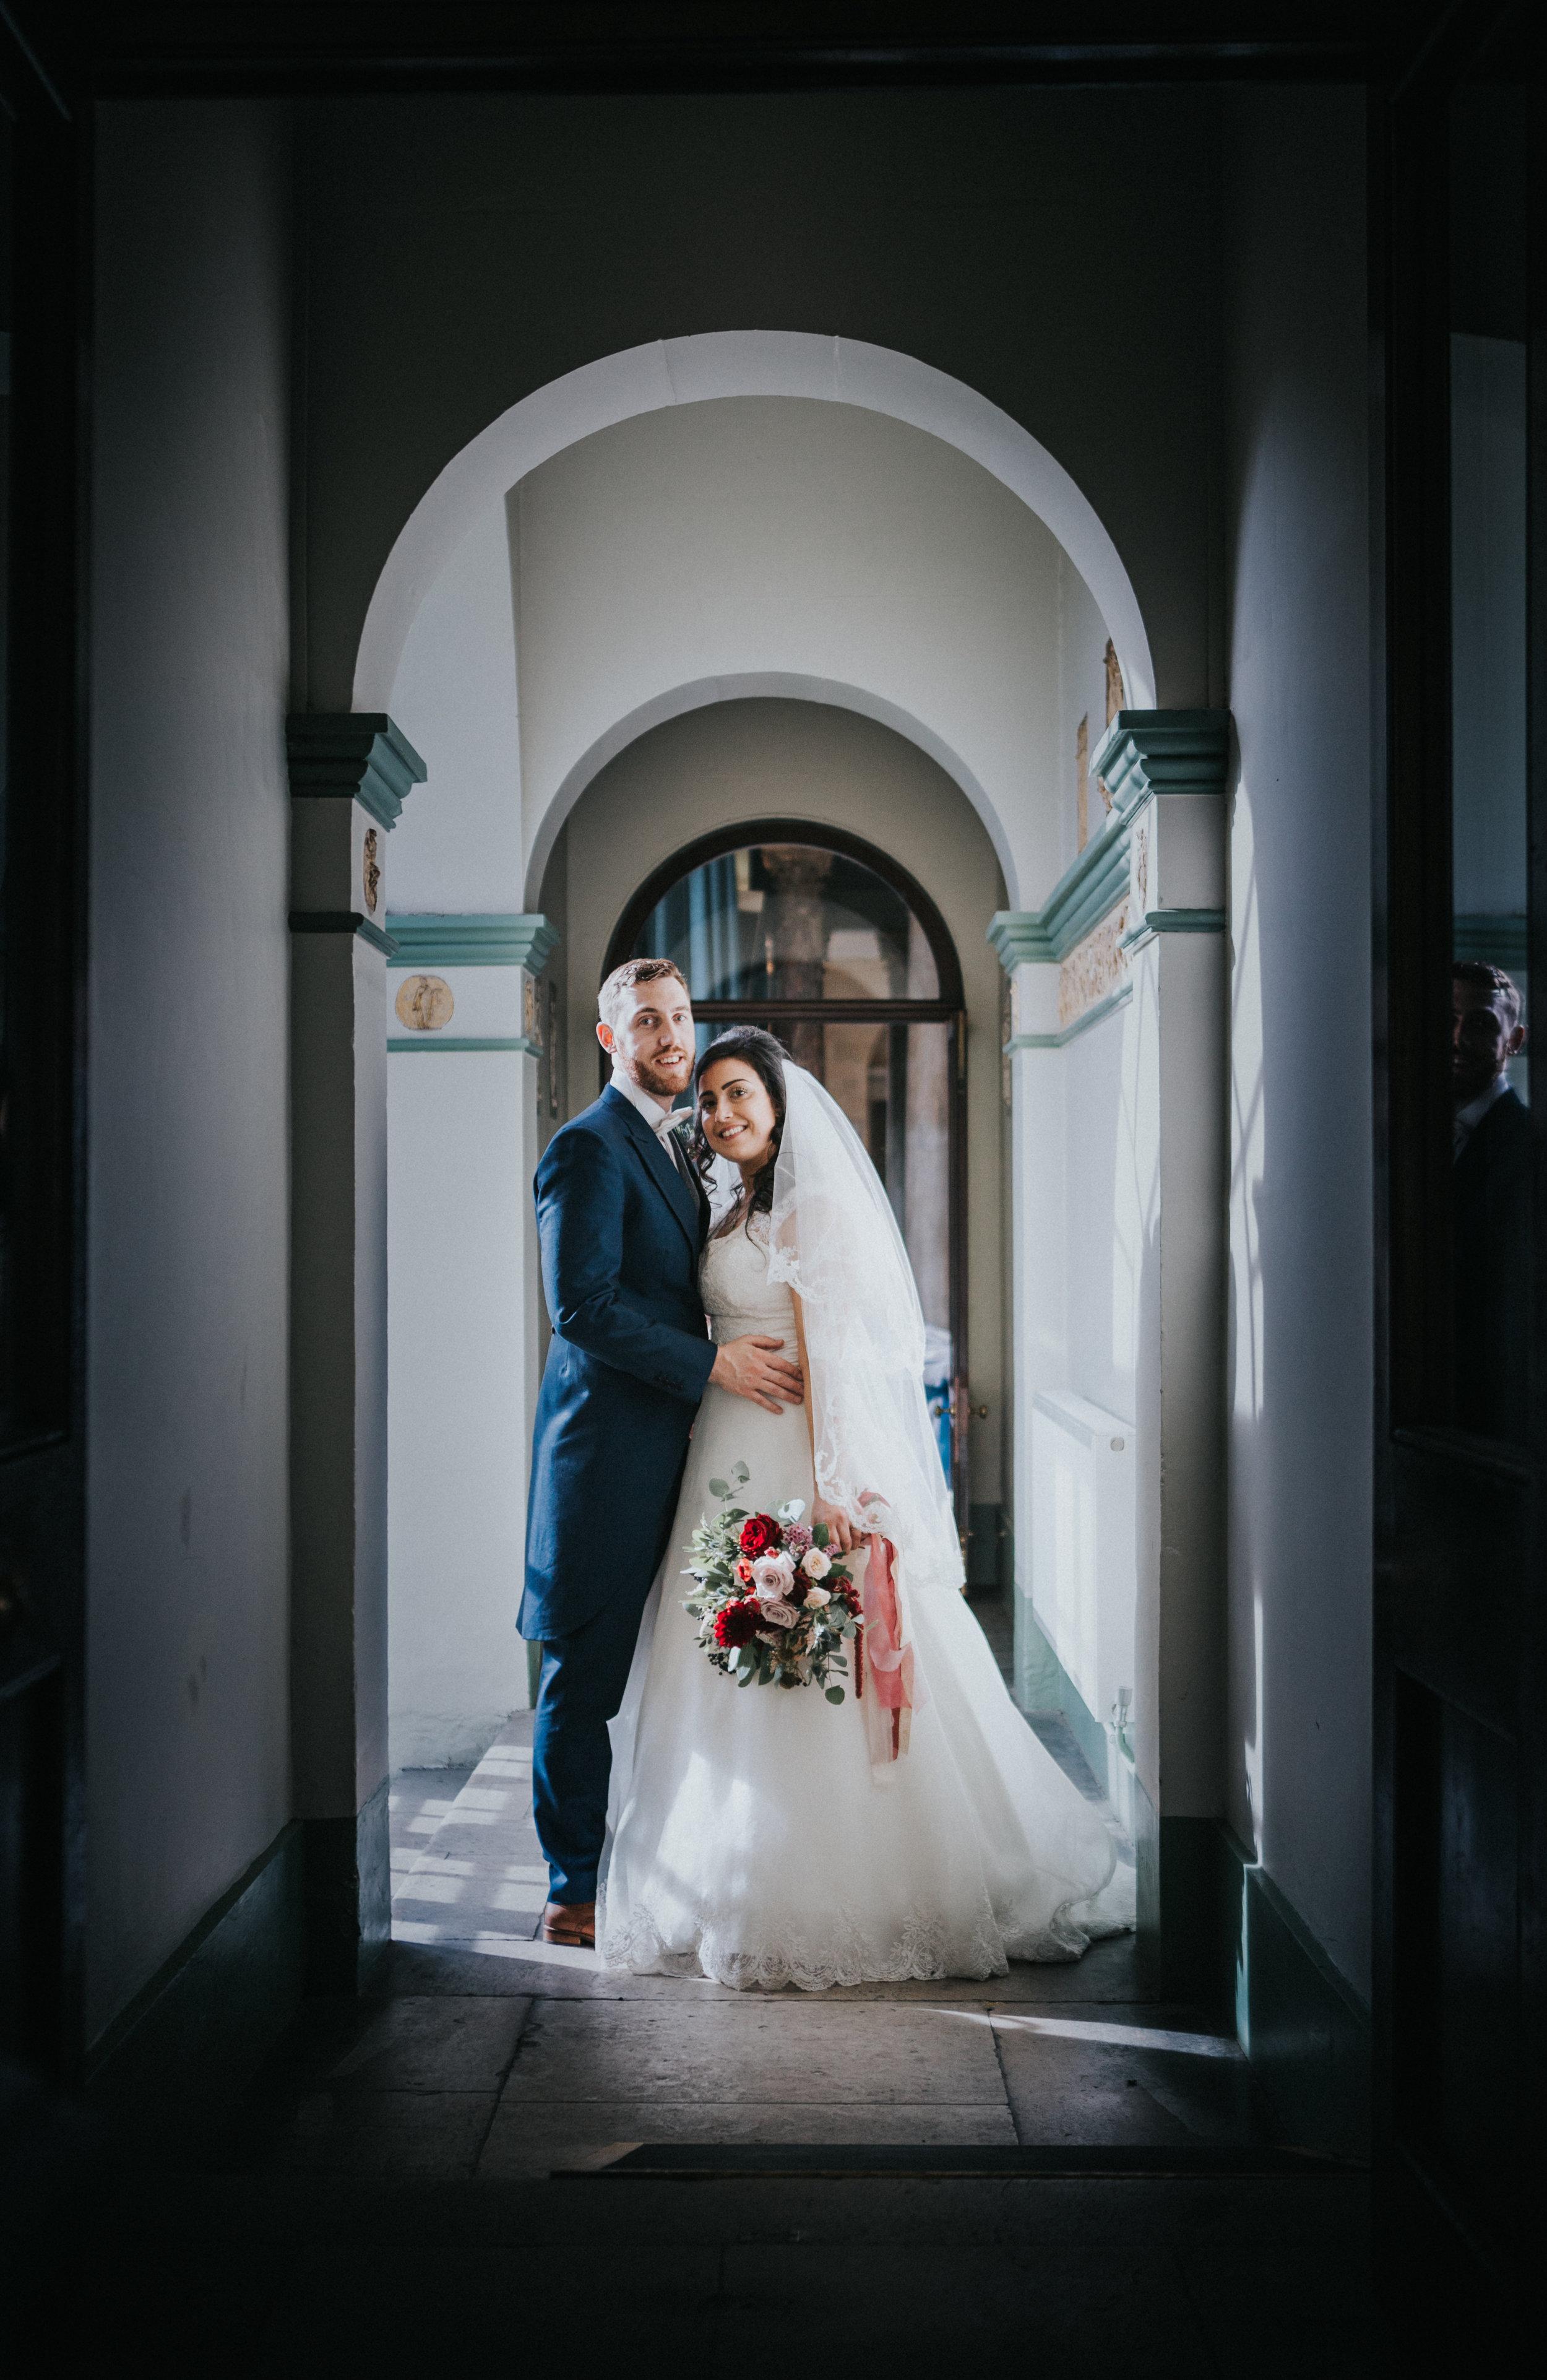 london-bedfordshire-uk-wedding-photography-woburn-sculpture-gallery-bridal-portrait-54